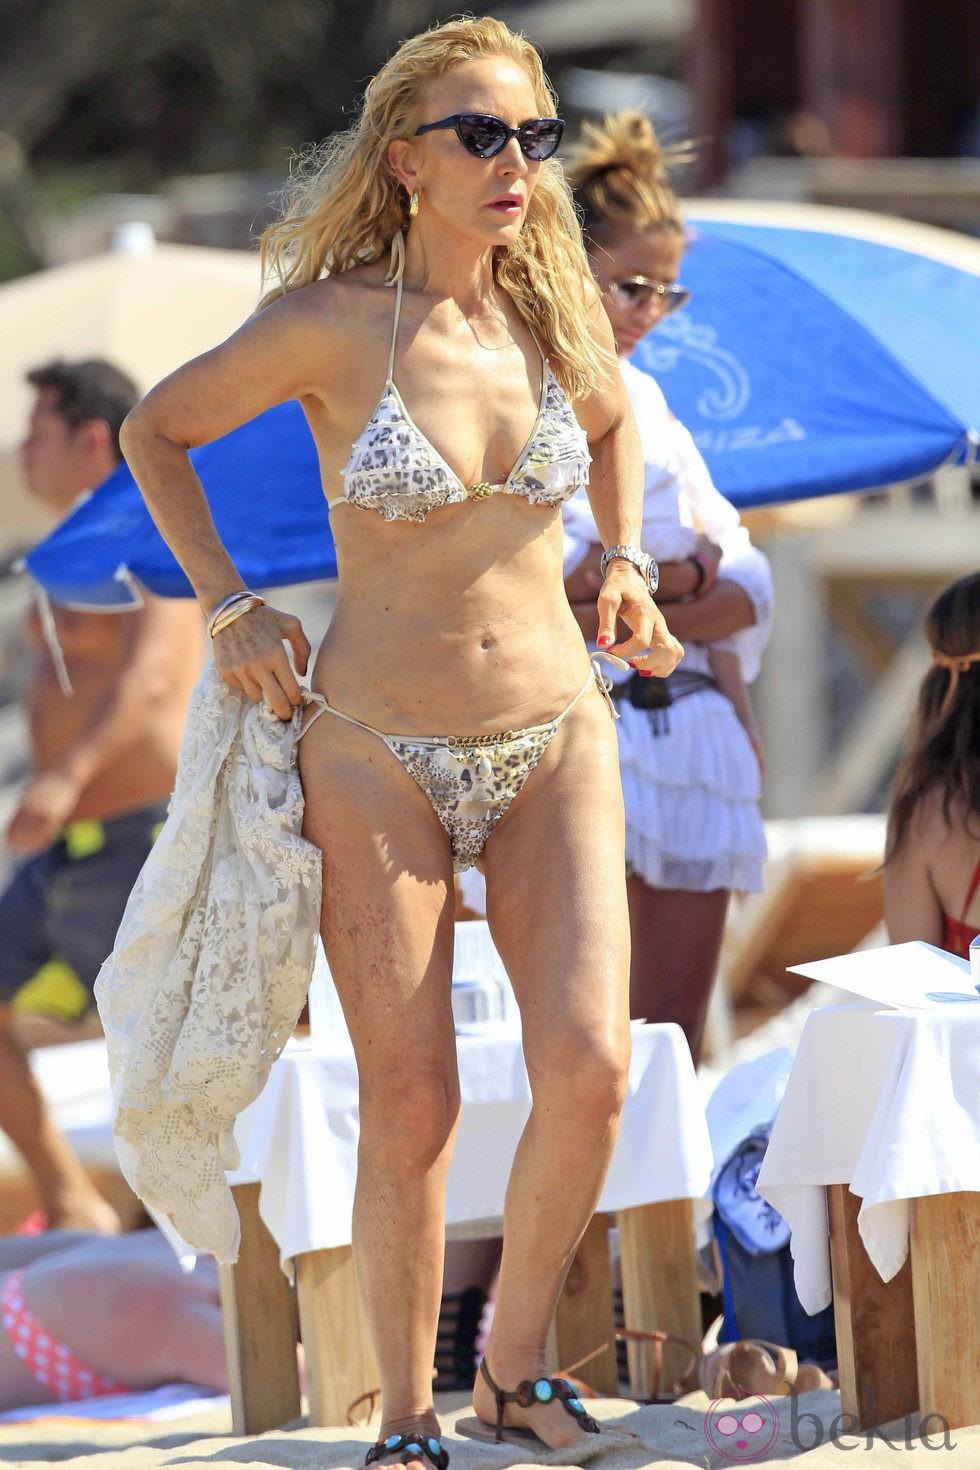 Splash - famosos, saltos y Guti - Página 2 22545_carmen-lomana-disfruta-biquini-playas-marbella